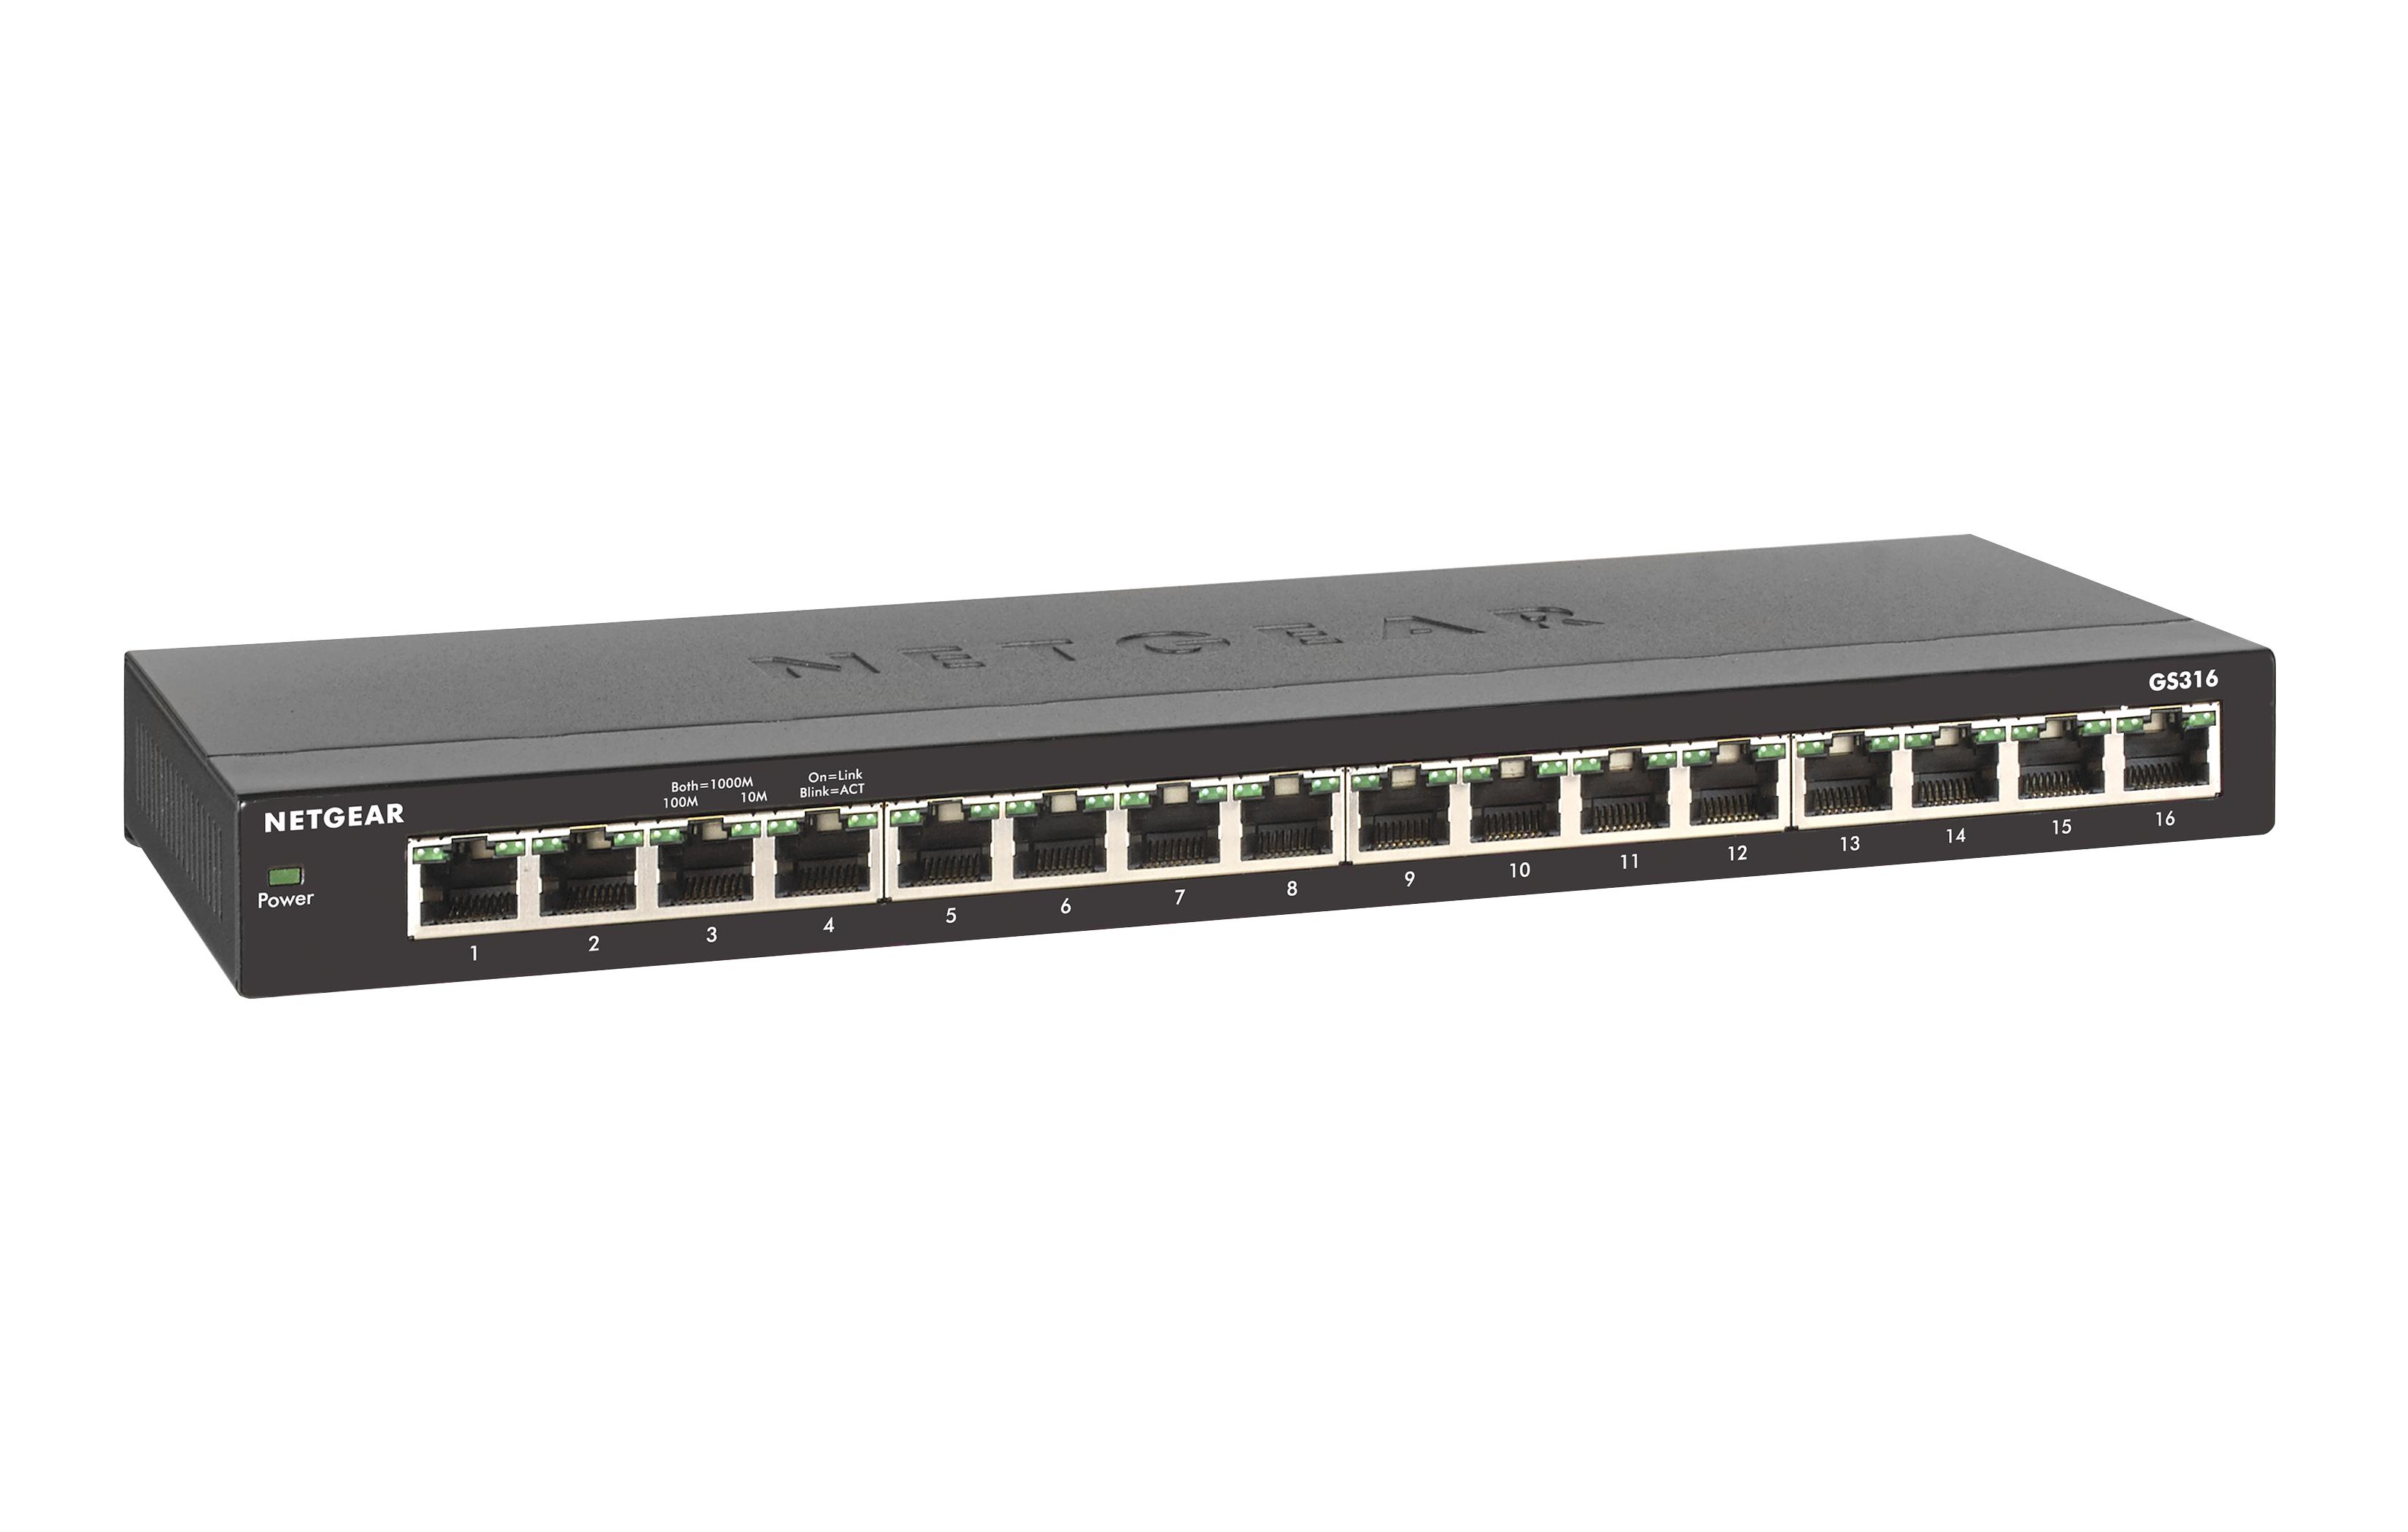 Netgear Gs316 Unmanaged Gigabit Ethernet 10 100 1000